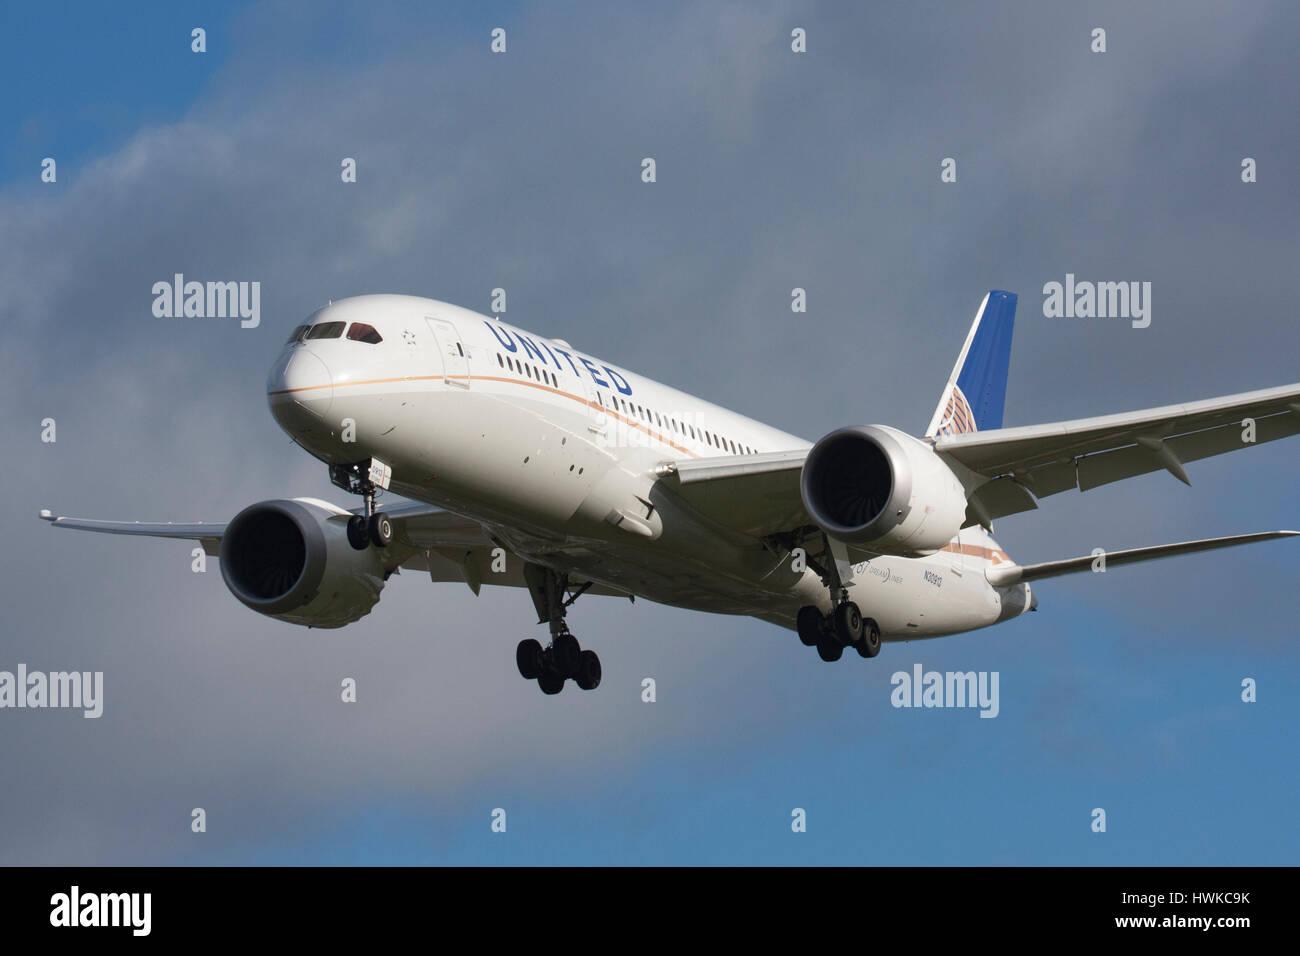 at London Heathrow Airport, UK - Stock Image